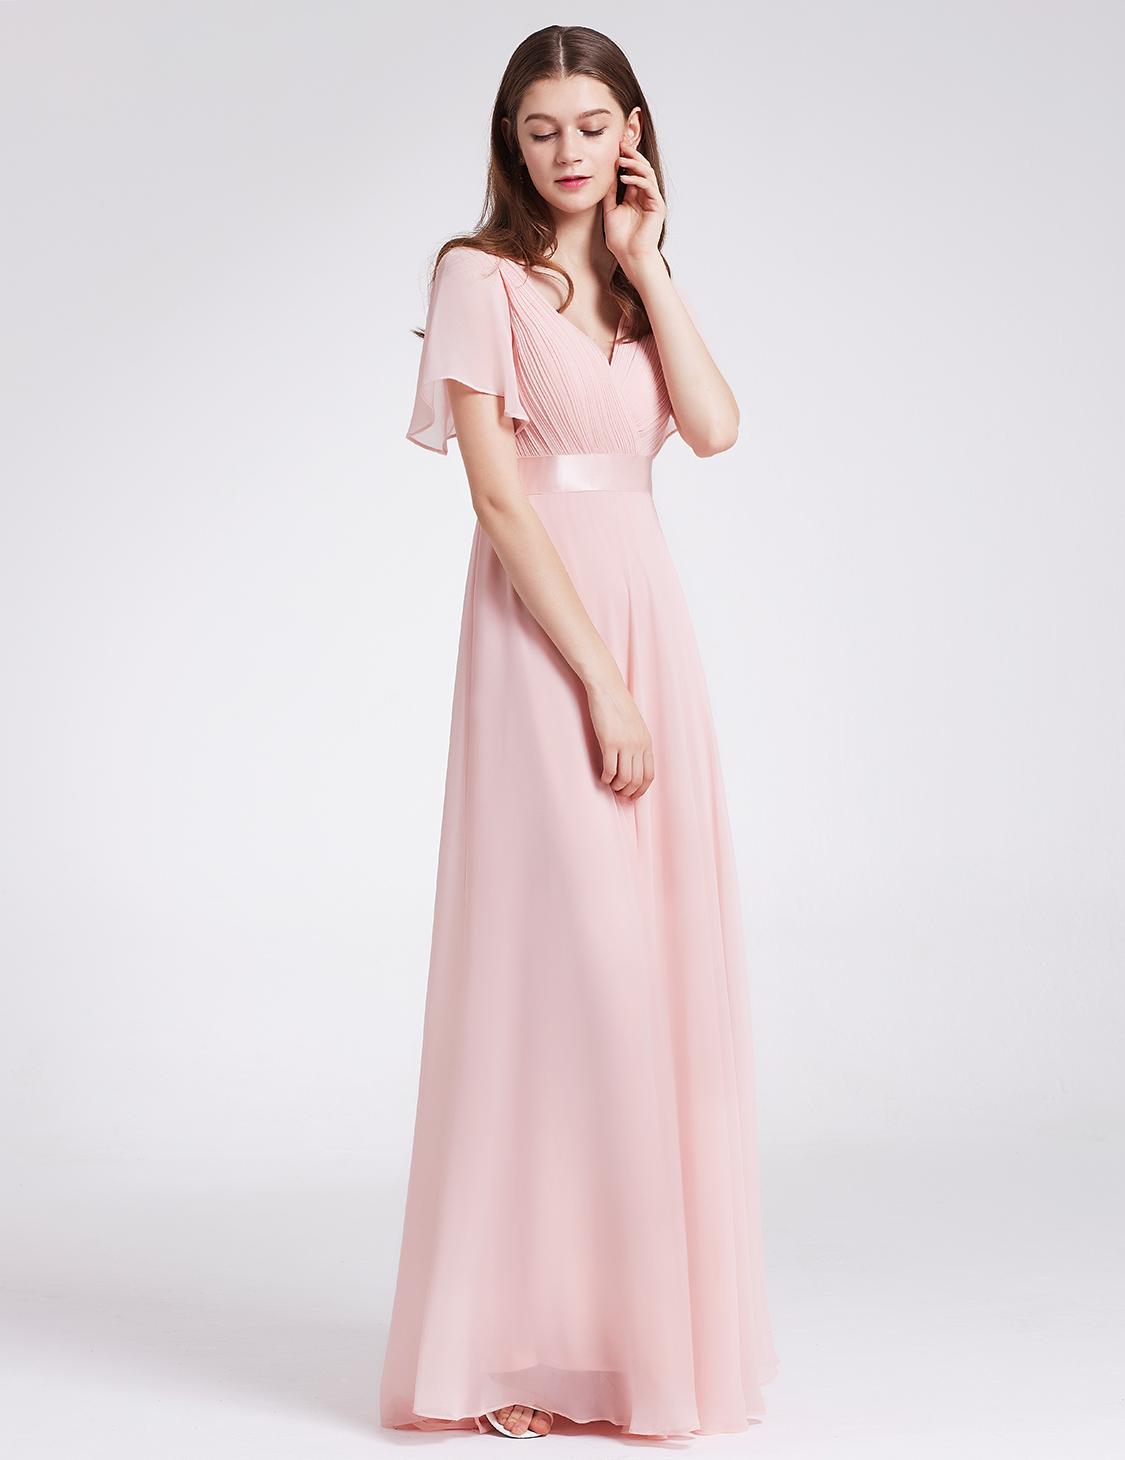 Ever-pretty-UK-Women-Pink-Chiffon-Evening-Gowns-Bridesmaid-Wedding-Dresses-09890